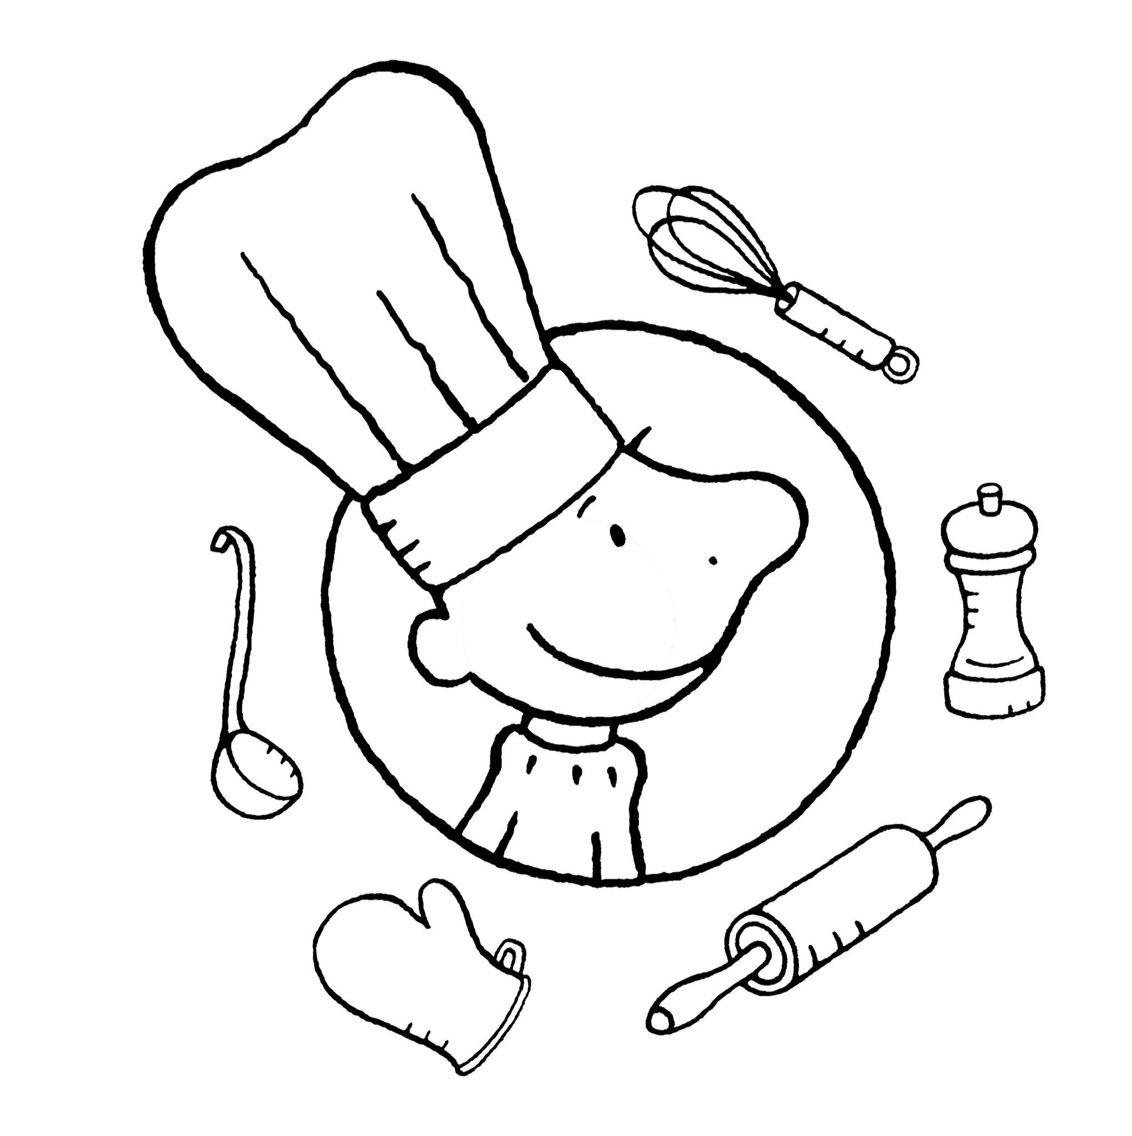 Kleurplaten Koken En Eten.Kleurplaat Jules Koken Jules Food Themes Classroom Themes En